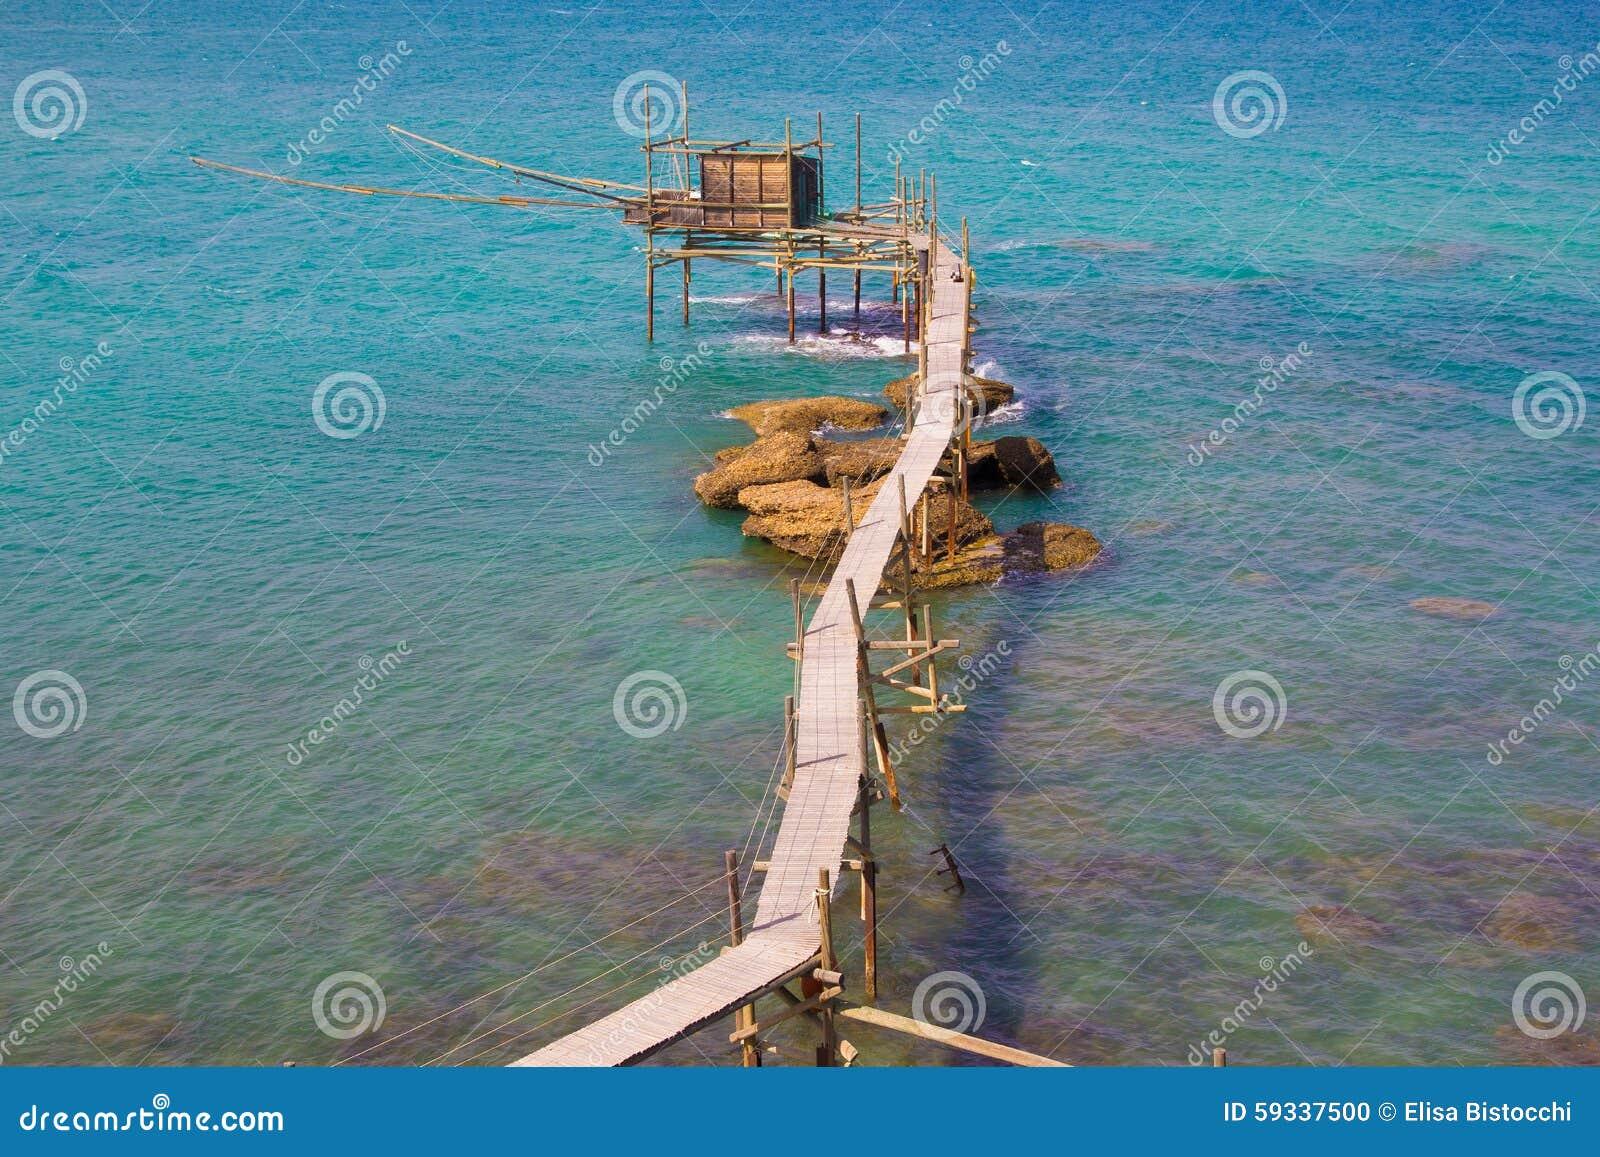 Trabocco of Punta Aderci, Abruzzo coast